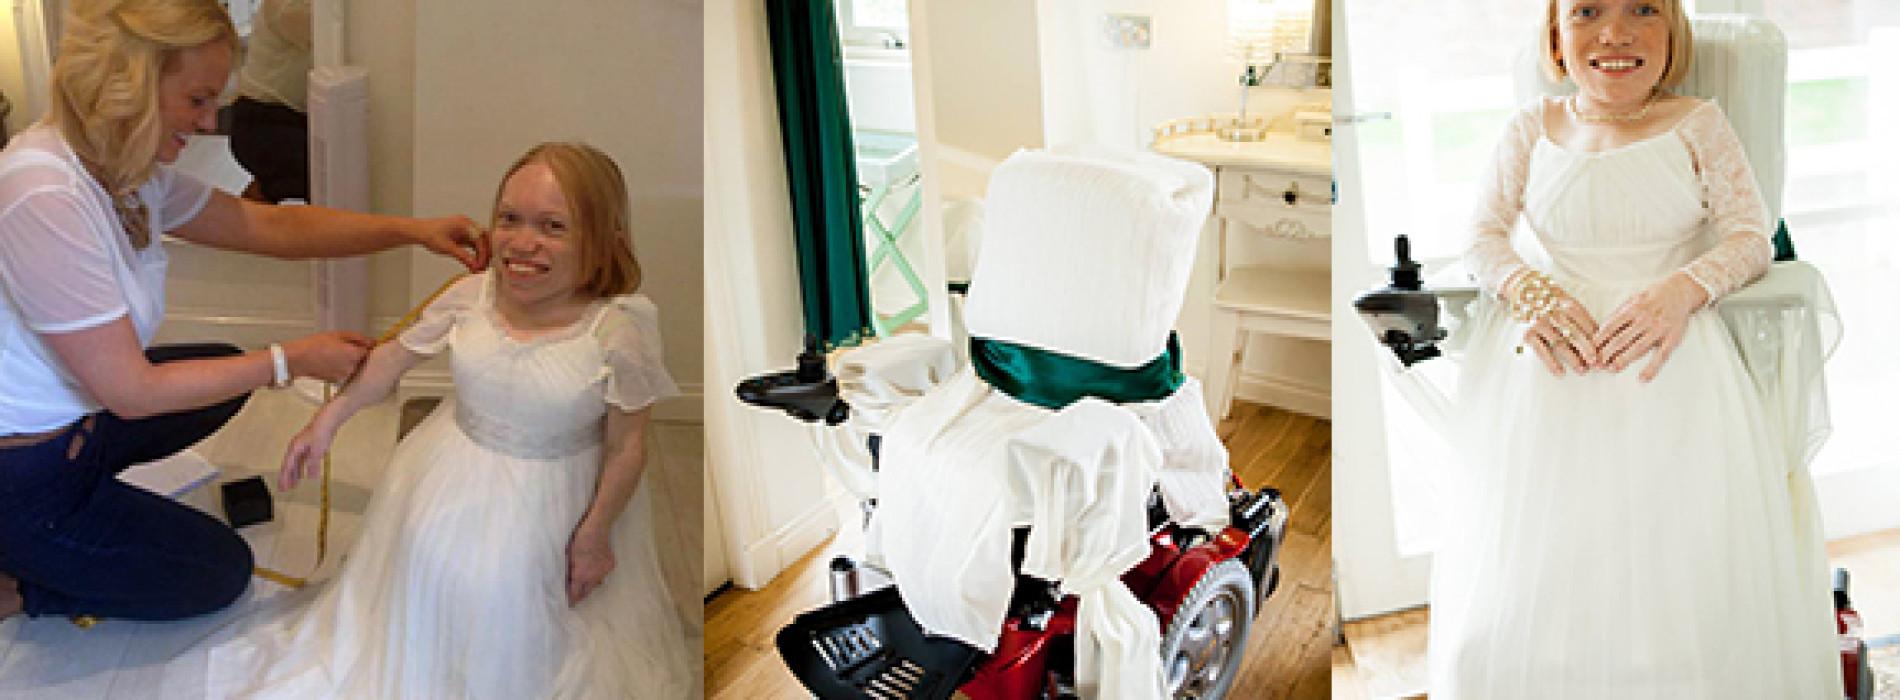 Wedding in a wheelchair